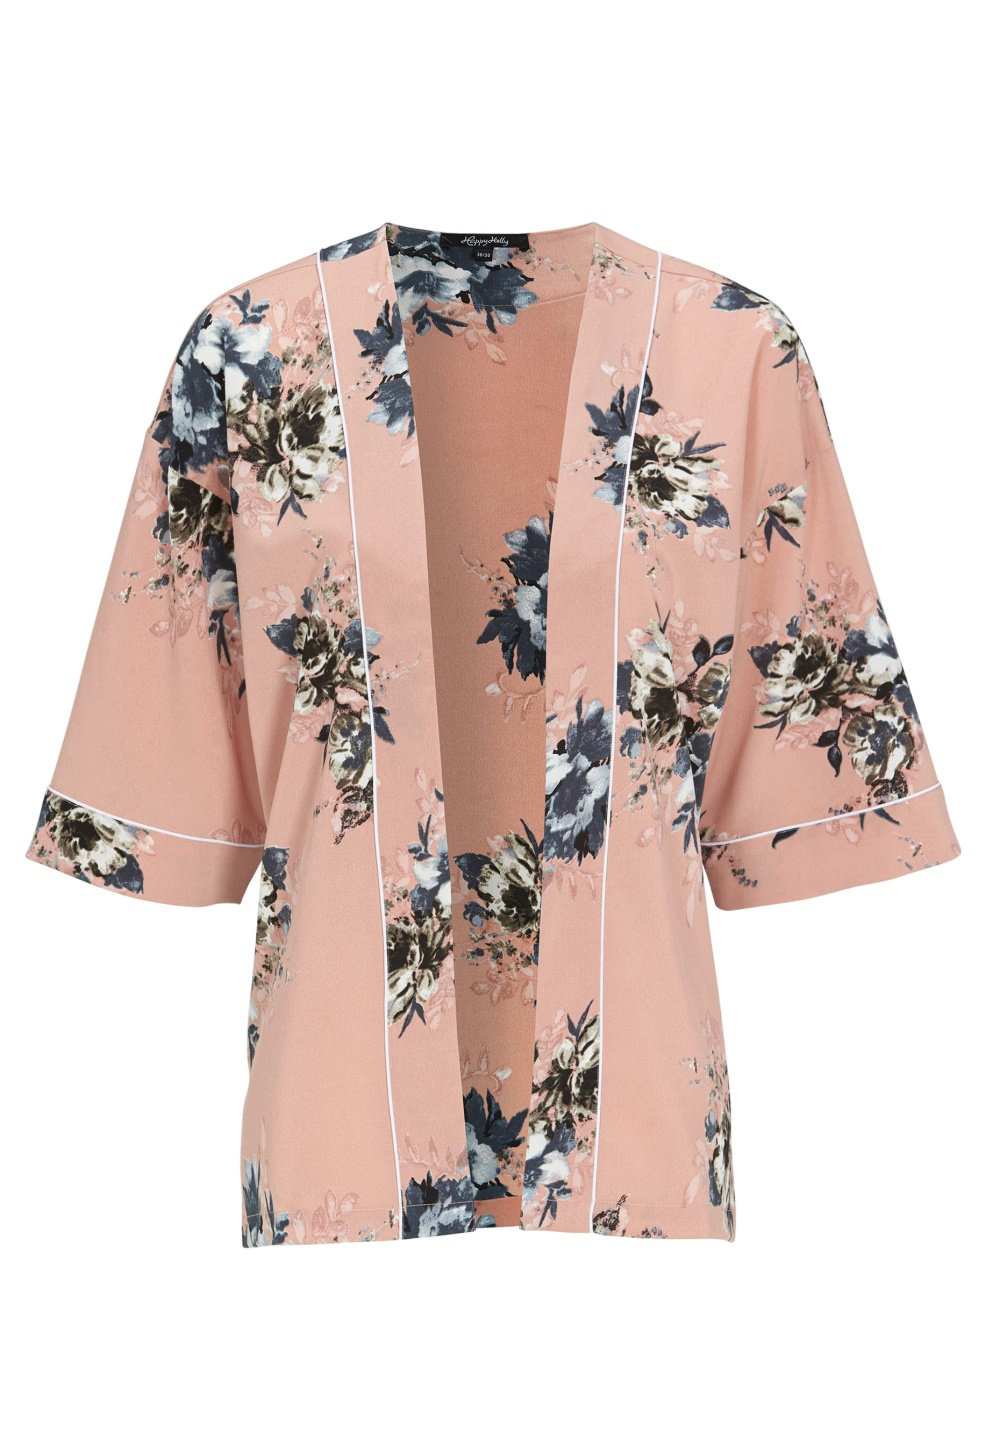 happy-holly-jelena-kimono-blouse-pink-patterned_12